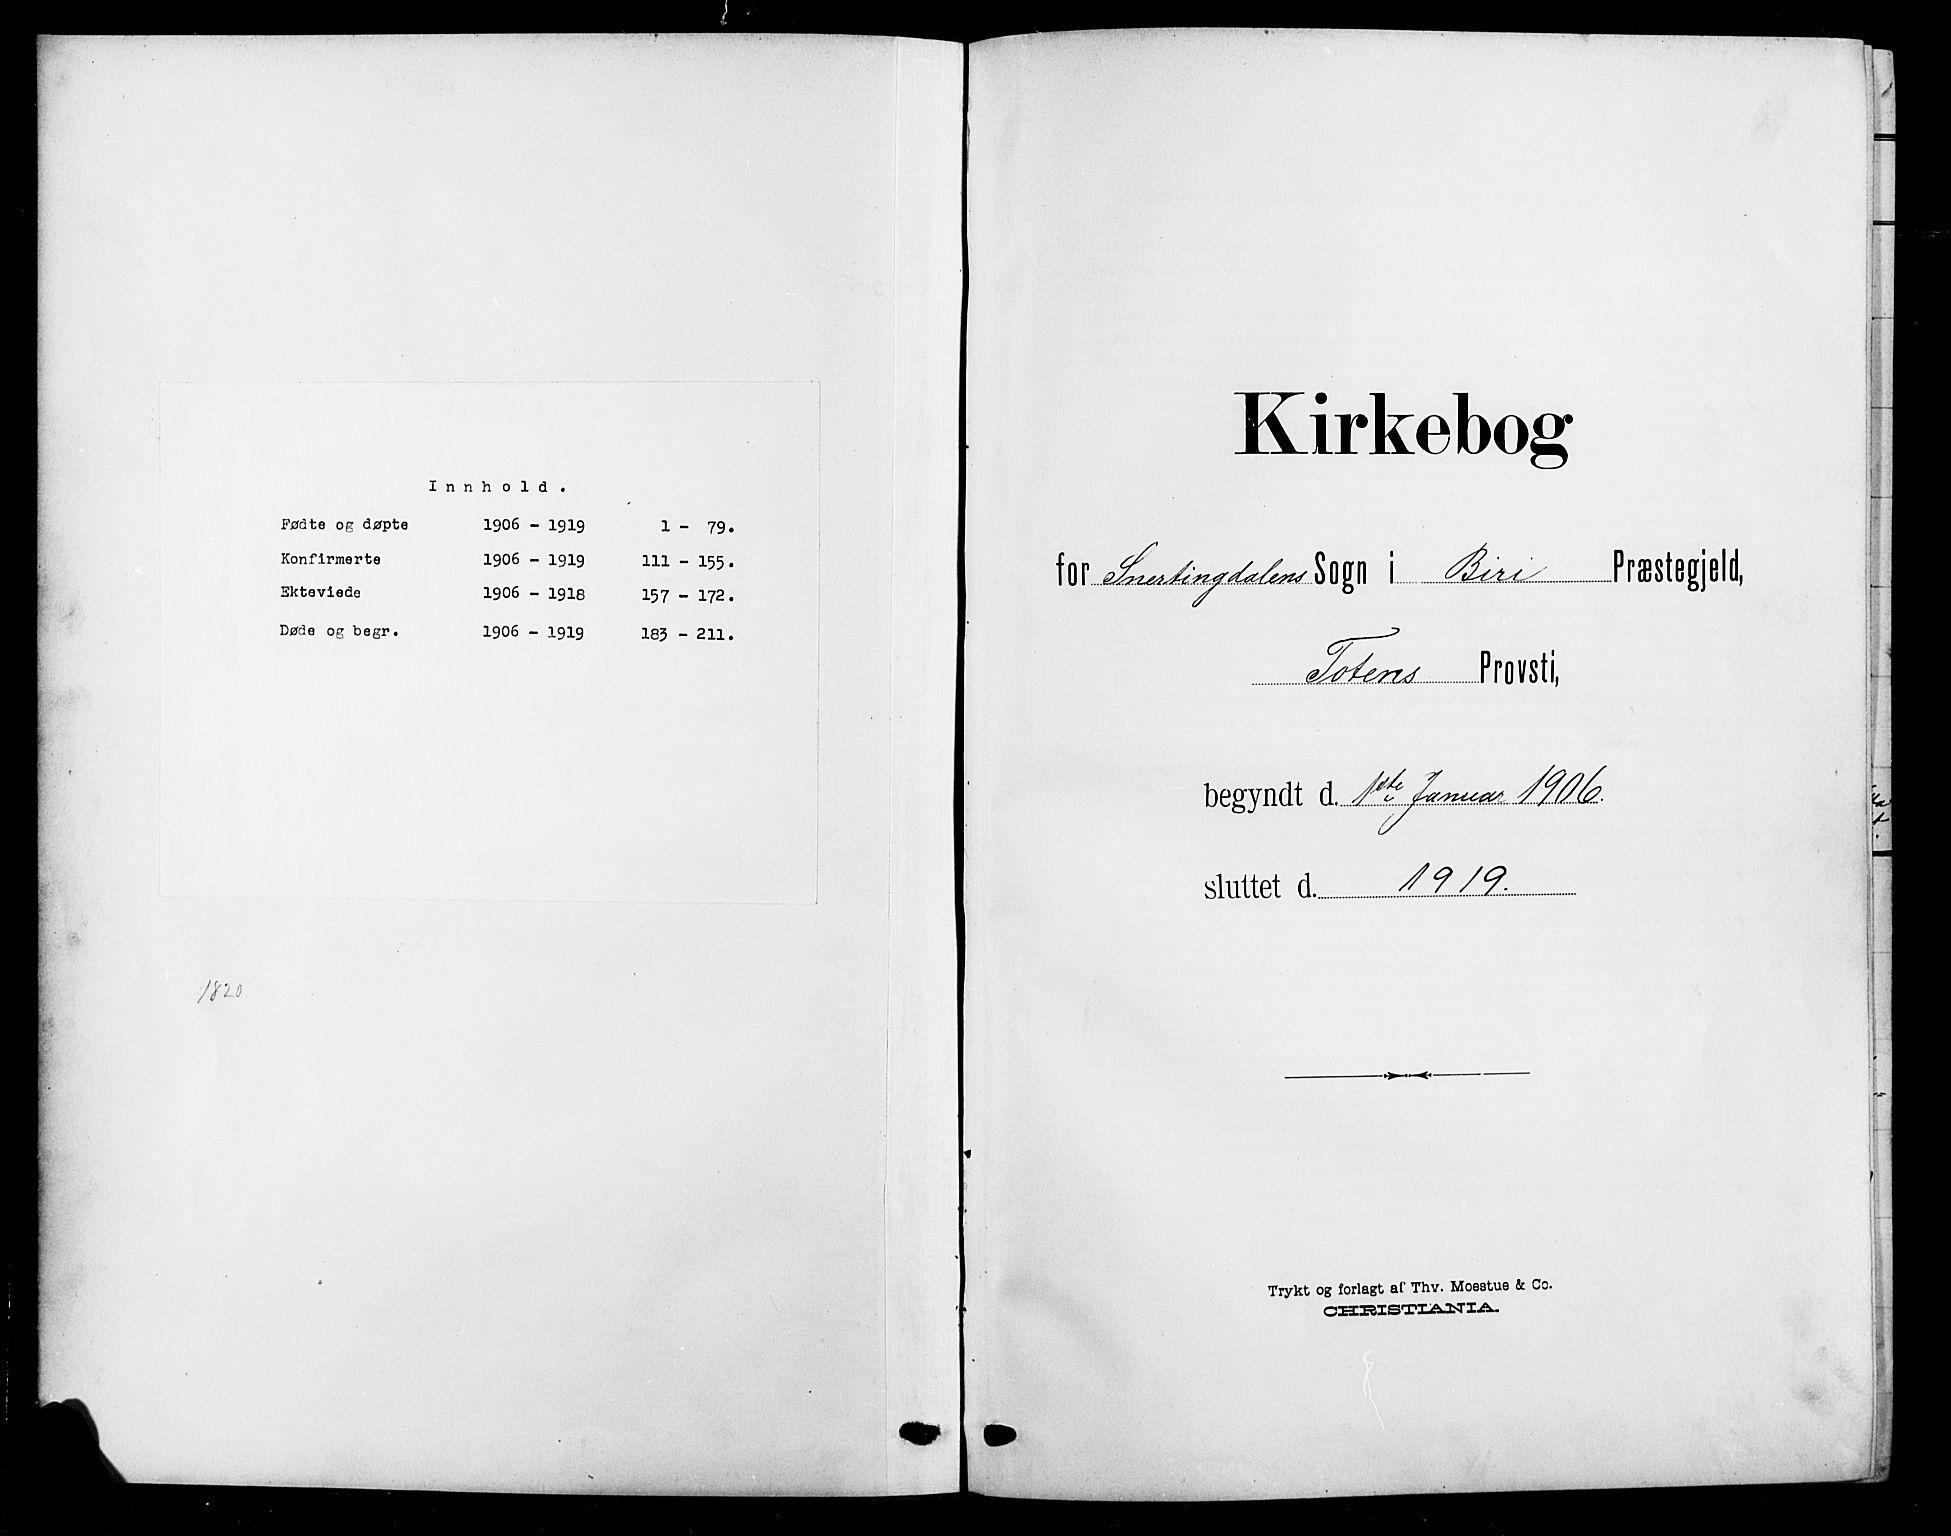 SAH, Biri prestekontor, Klokkerbok nr. 5, 1906-1919